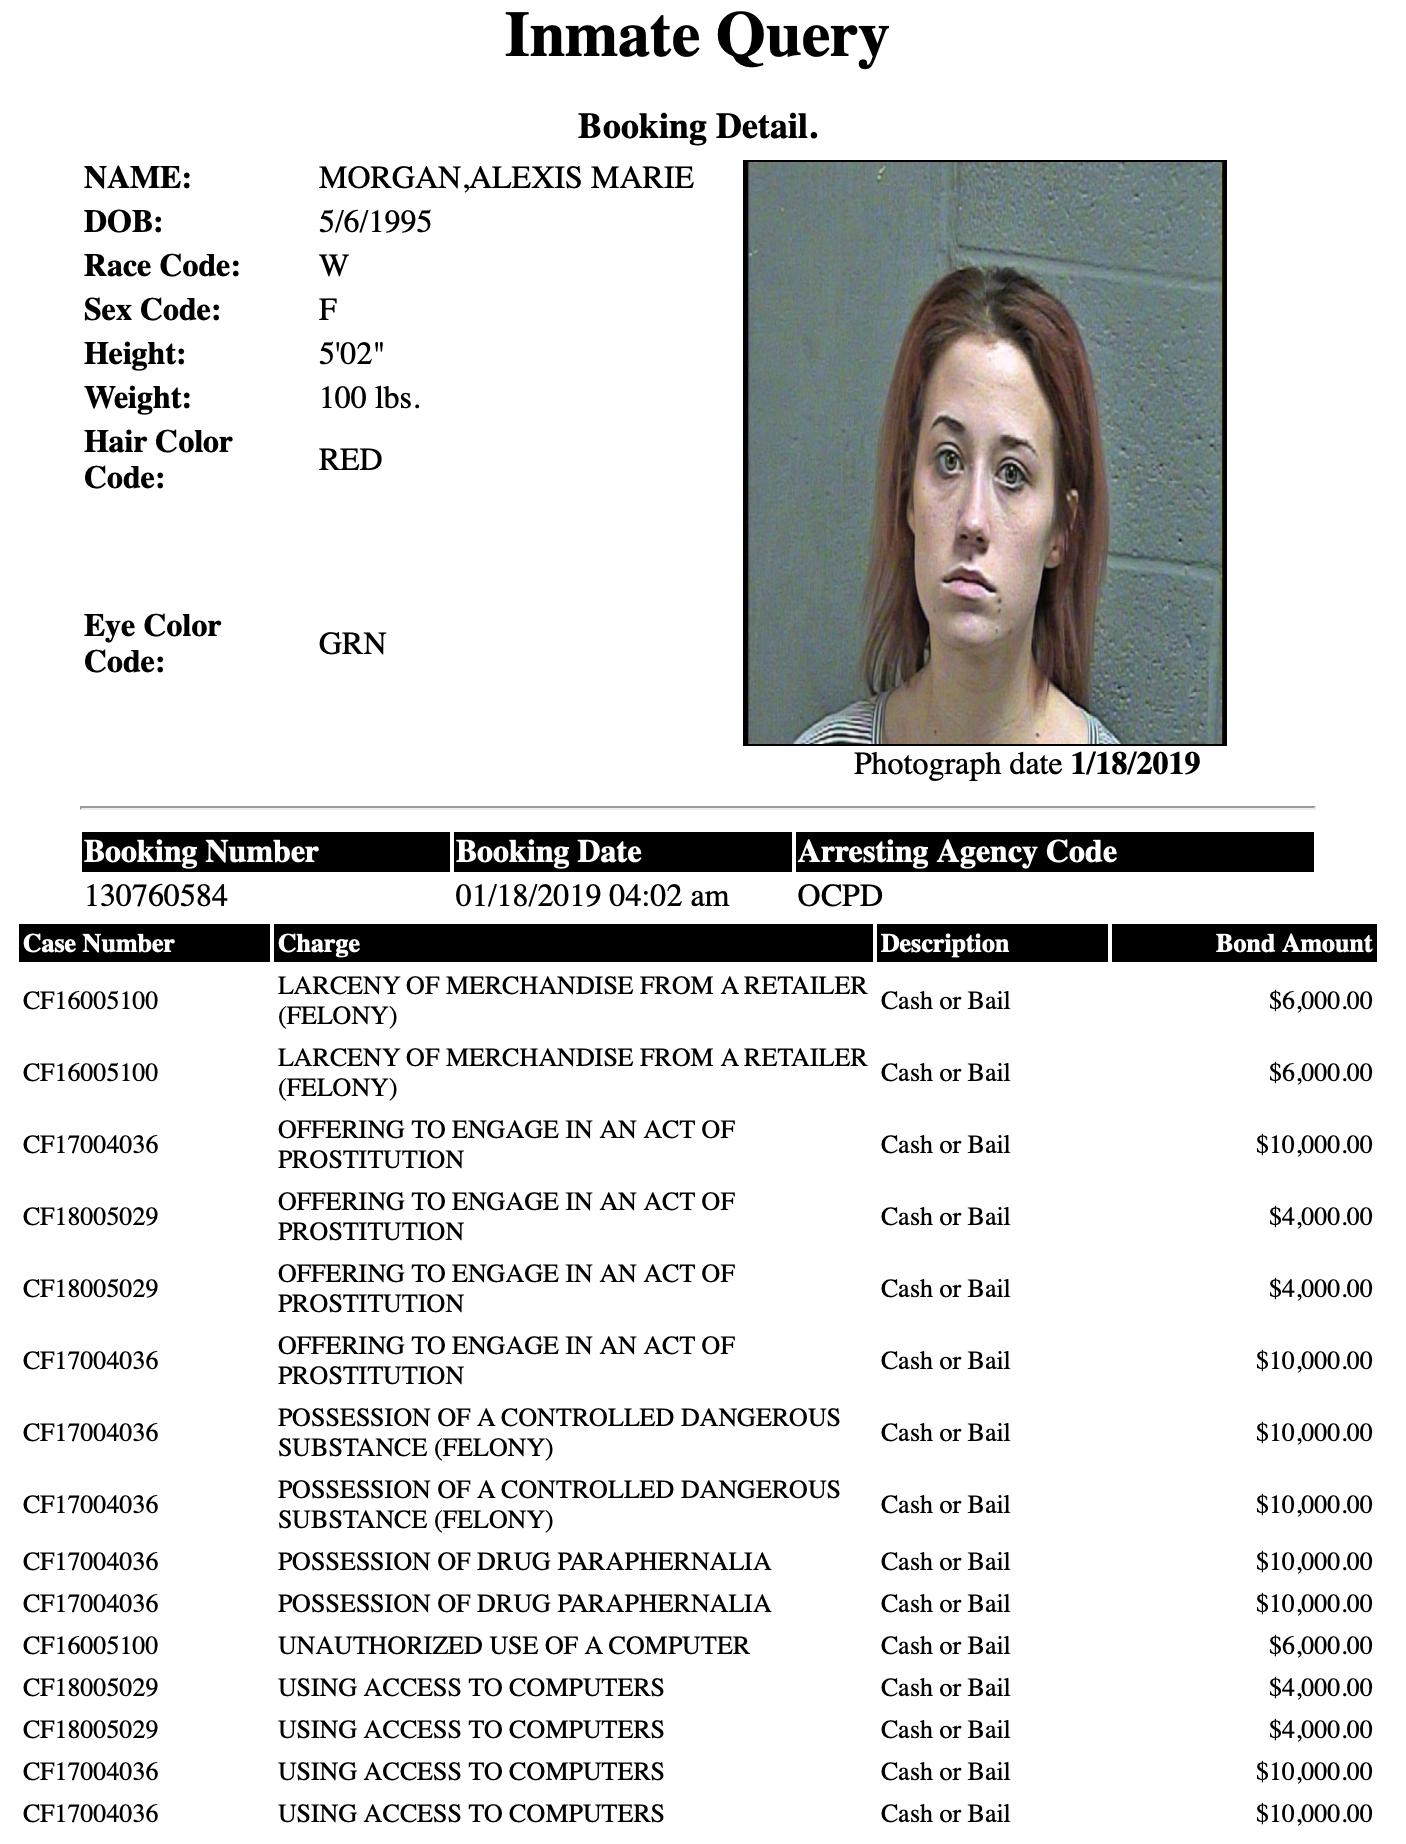 Morgan Alexis Marie Mugshot Prostitute 2019-01-18.png